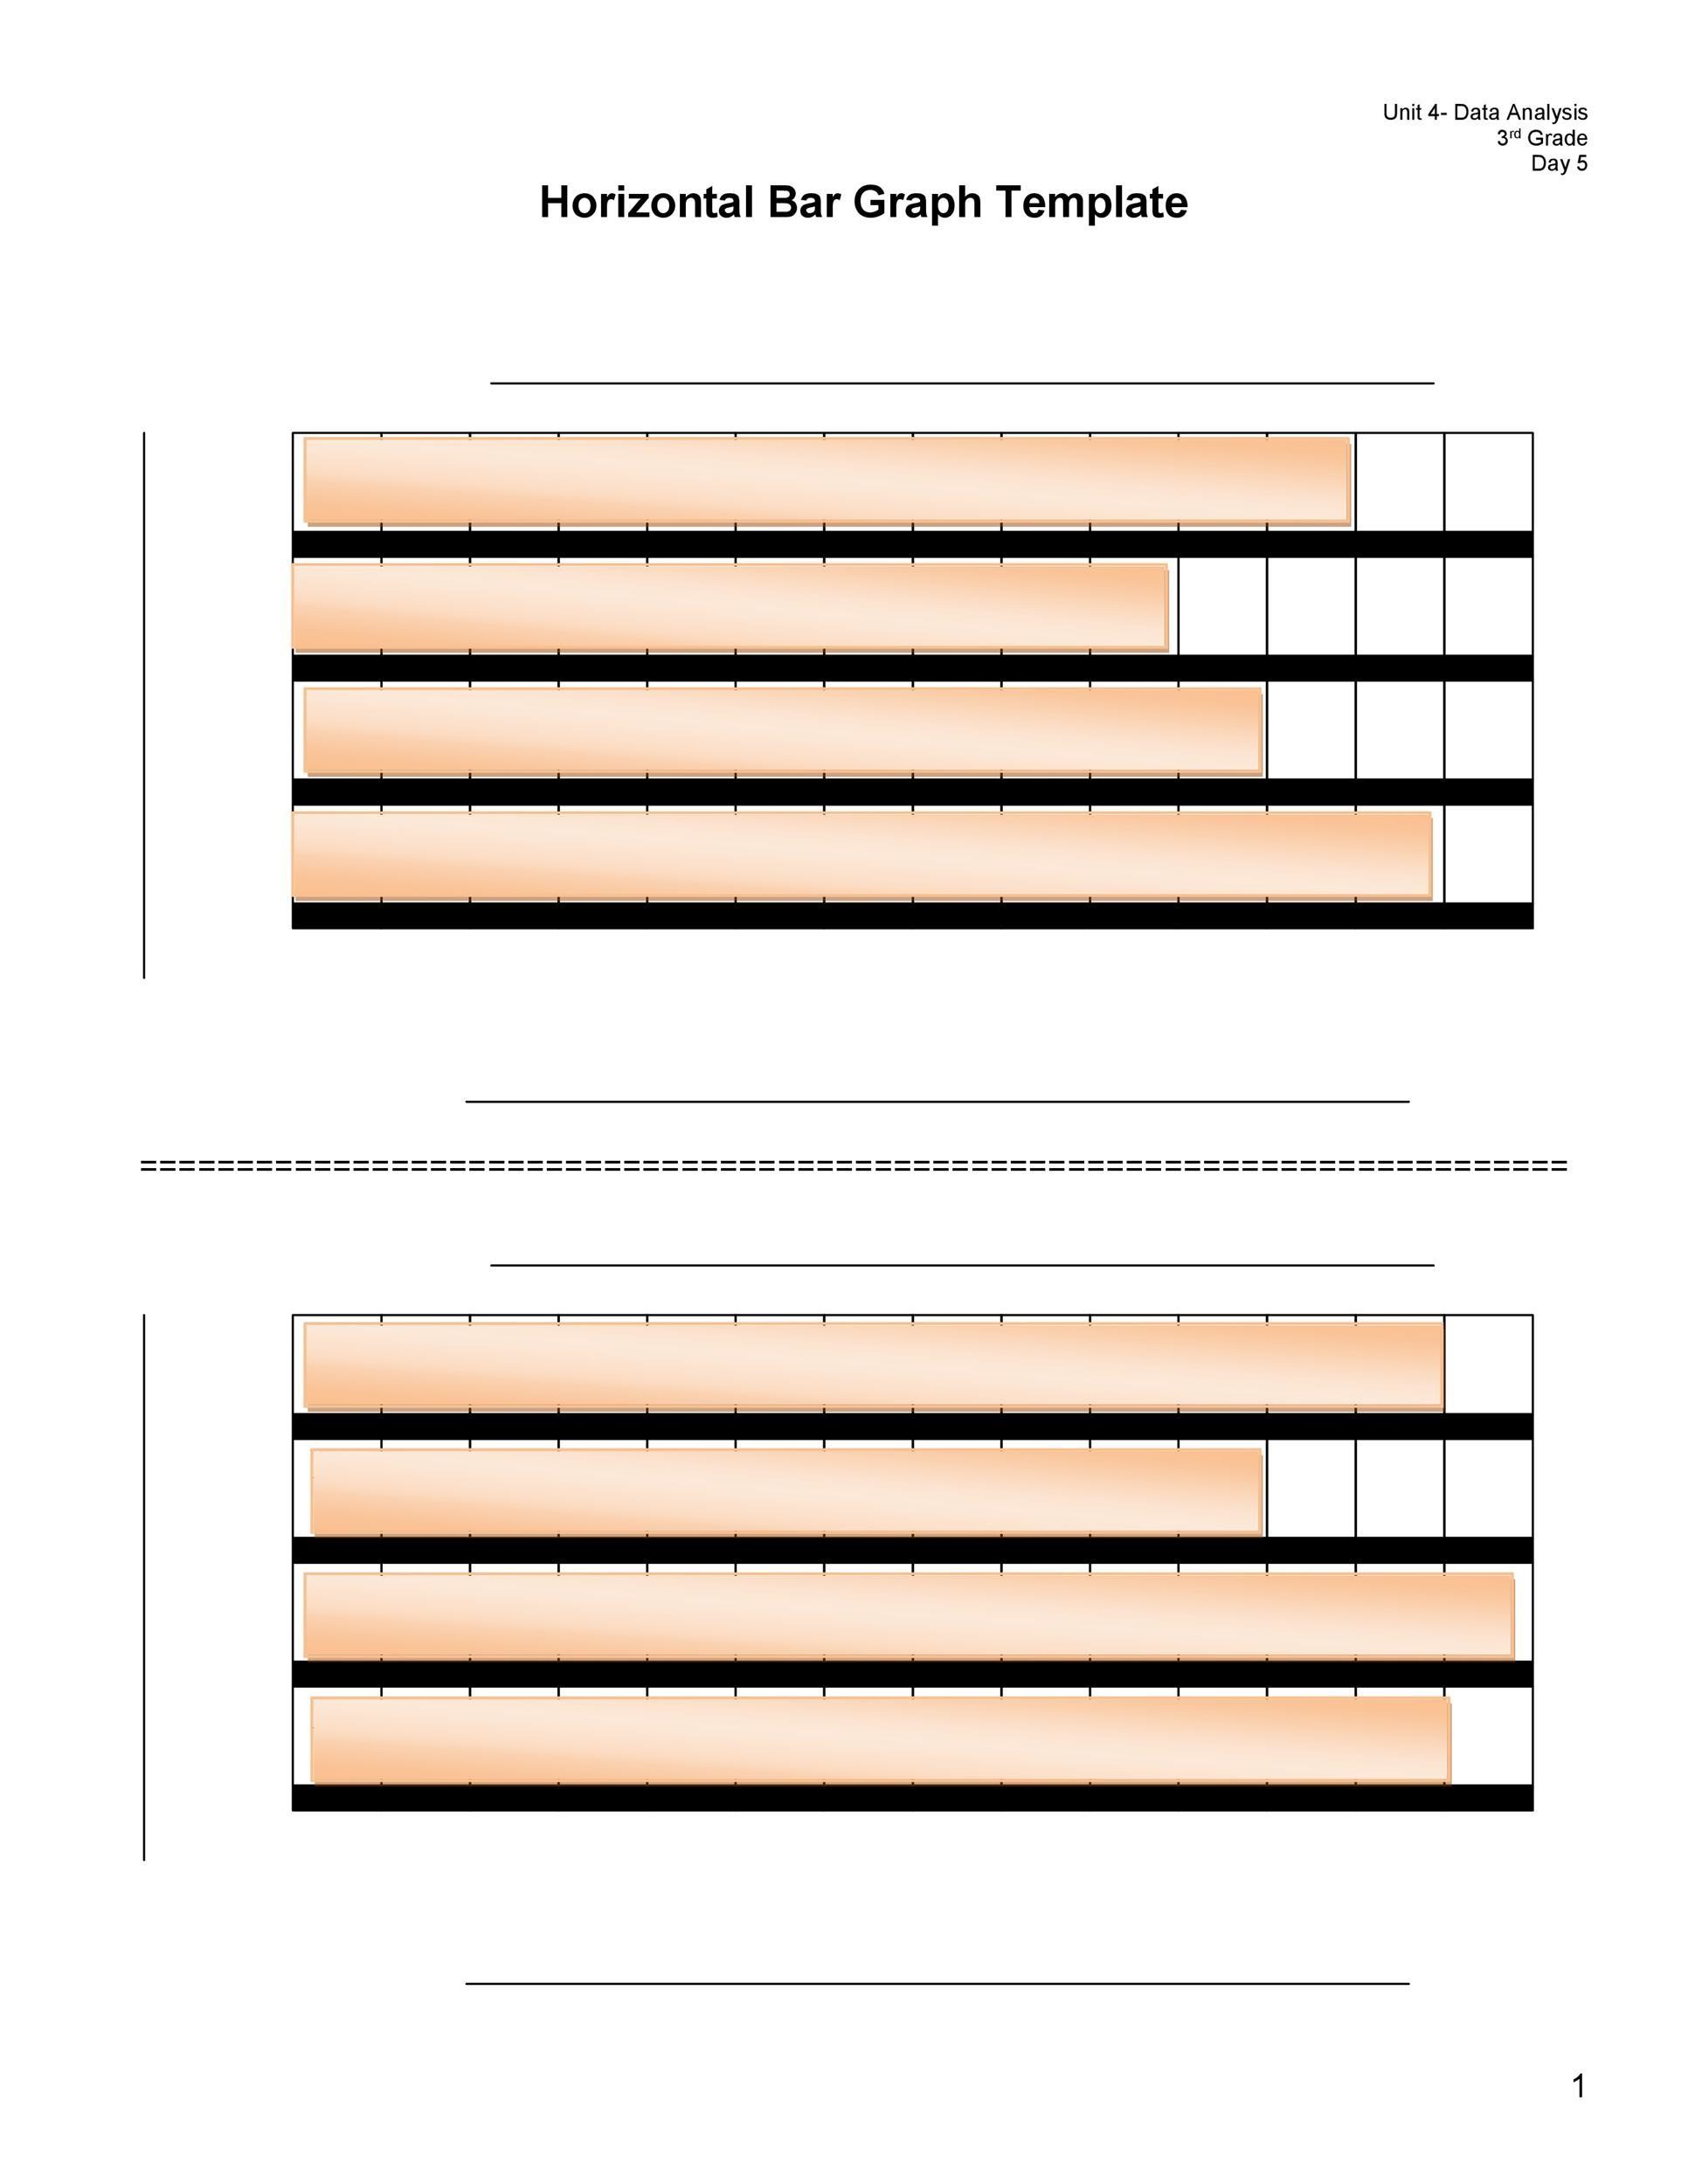 Horizontal Bar Graph Template